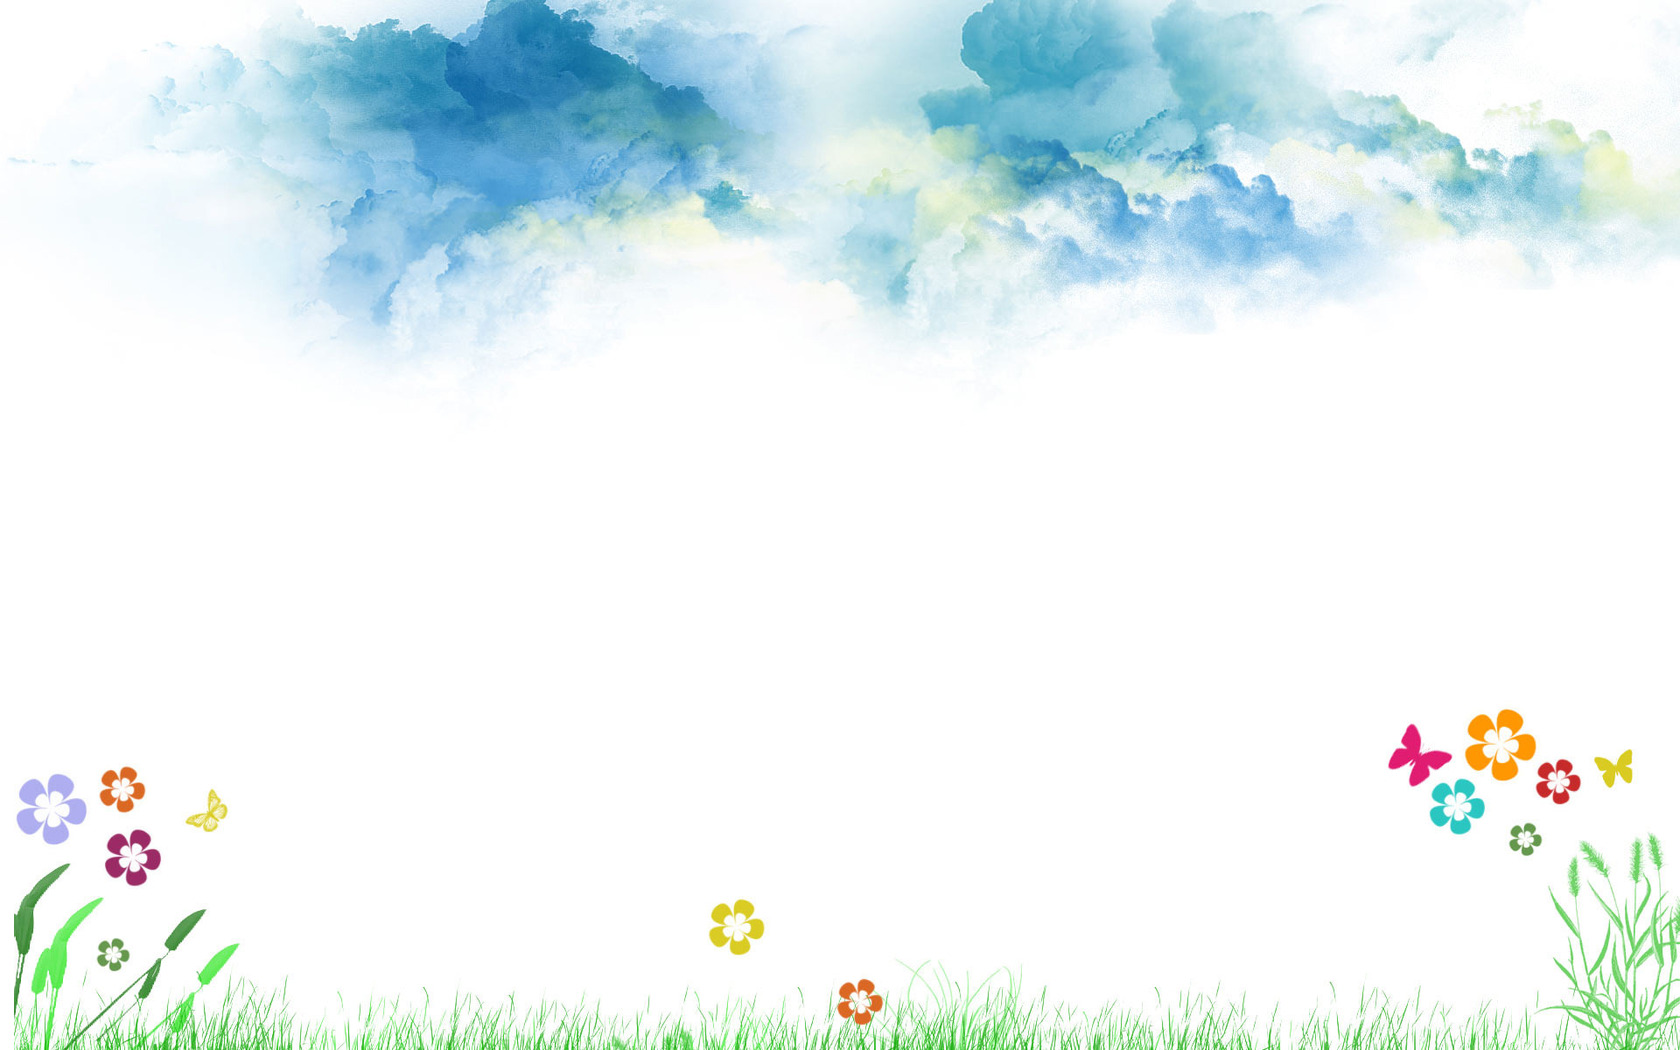 Download Flowers and butterflies wallpaper